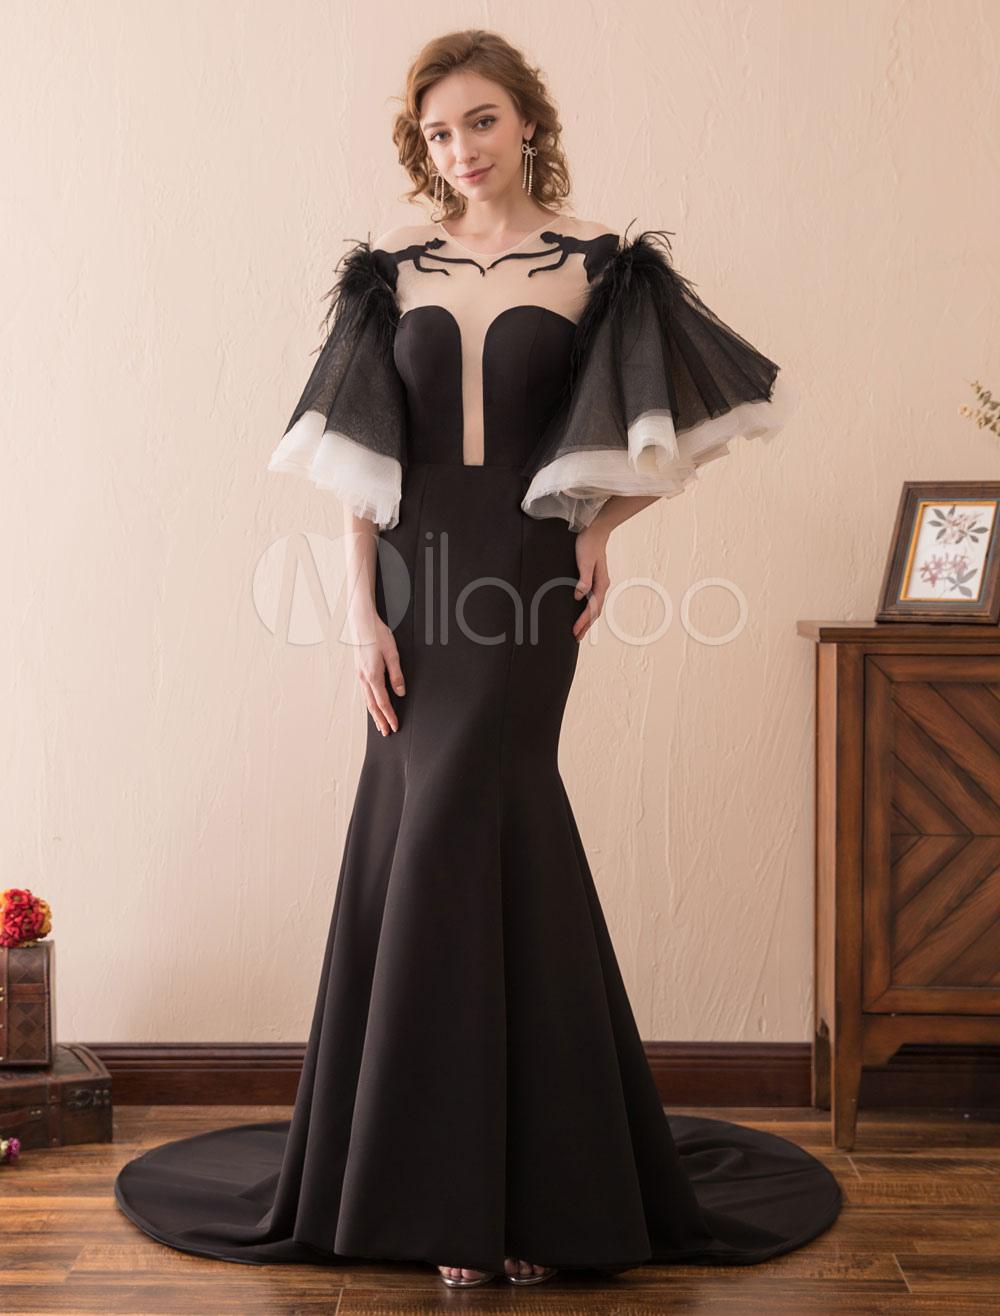 Black Evening Dresses Mermaid Long Prom Dress Bell Sleeve Ruffles Illusion Satin Formal Dresses (Wedding) photo